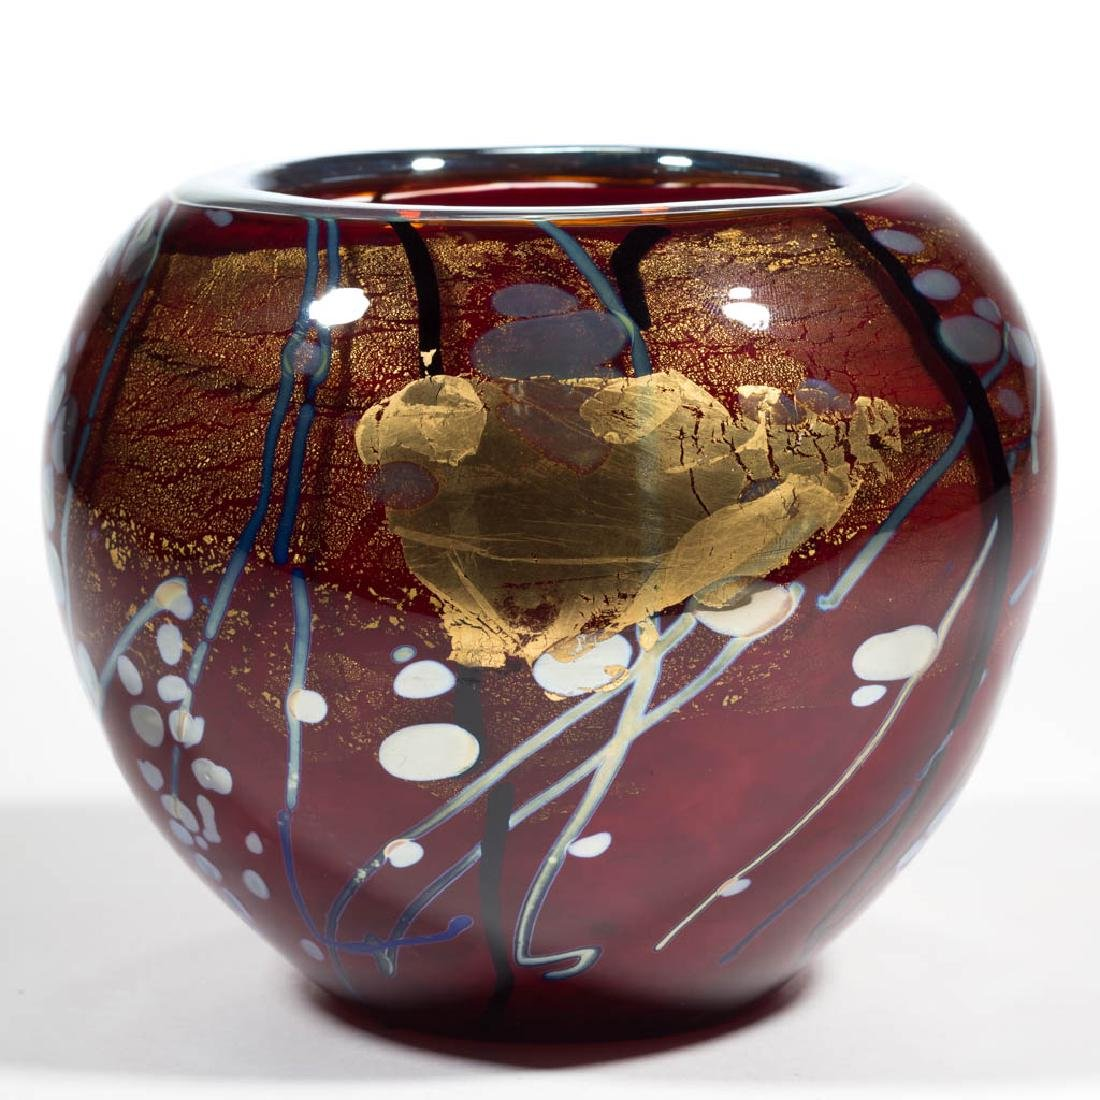 TIM LAZER SPLASH SERIES STUDIO ART GLASS VASE - 3